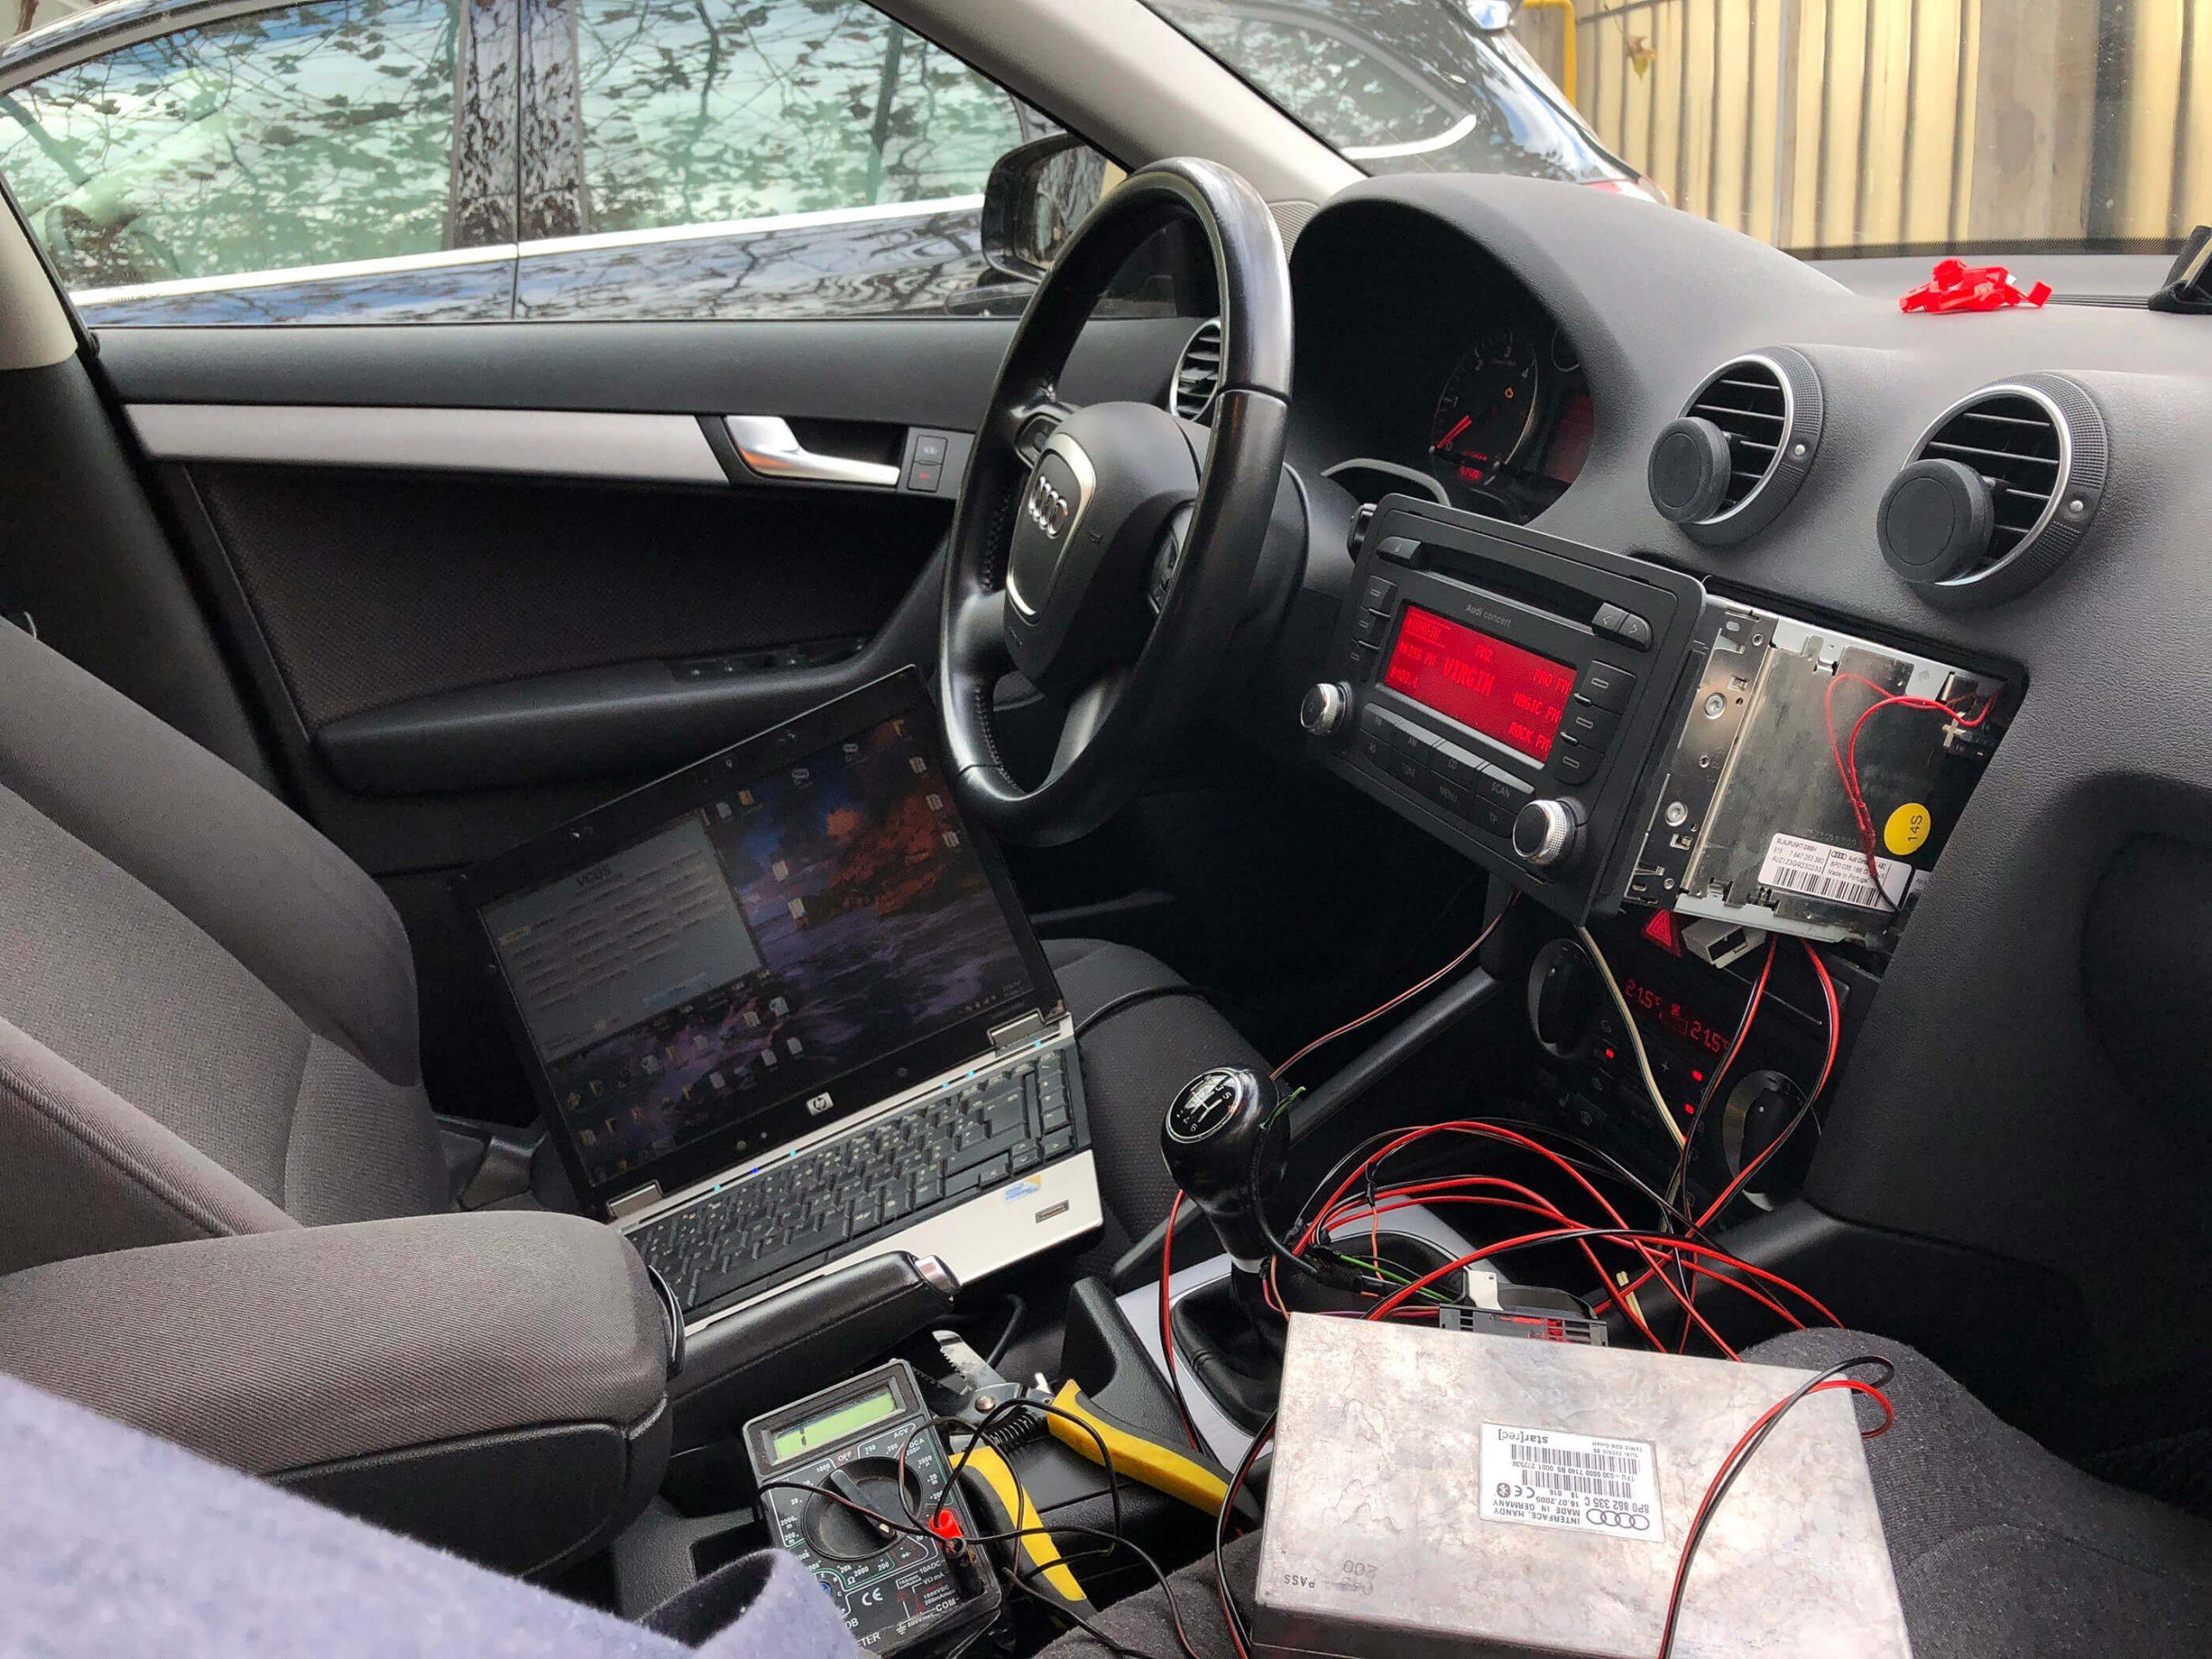 Instalare modul telefon OEM pe Audi A3